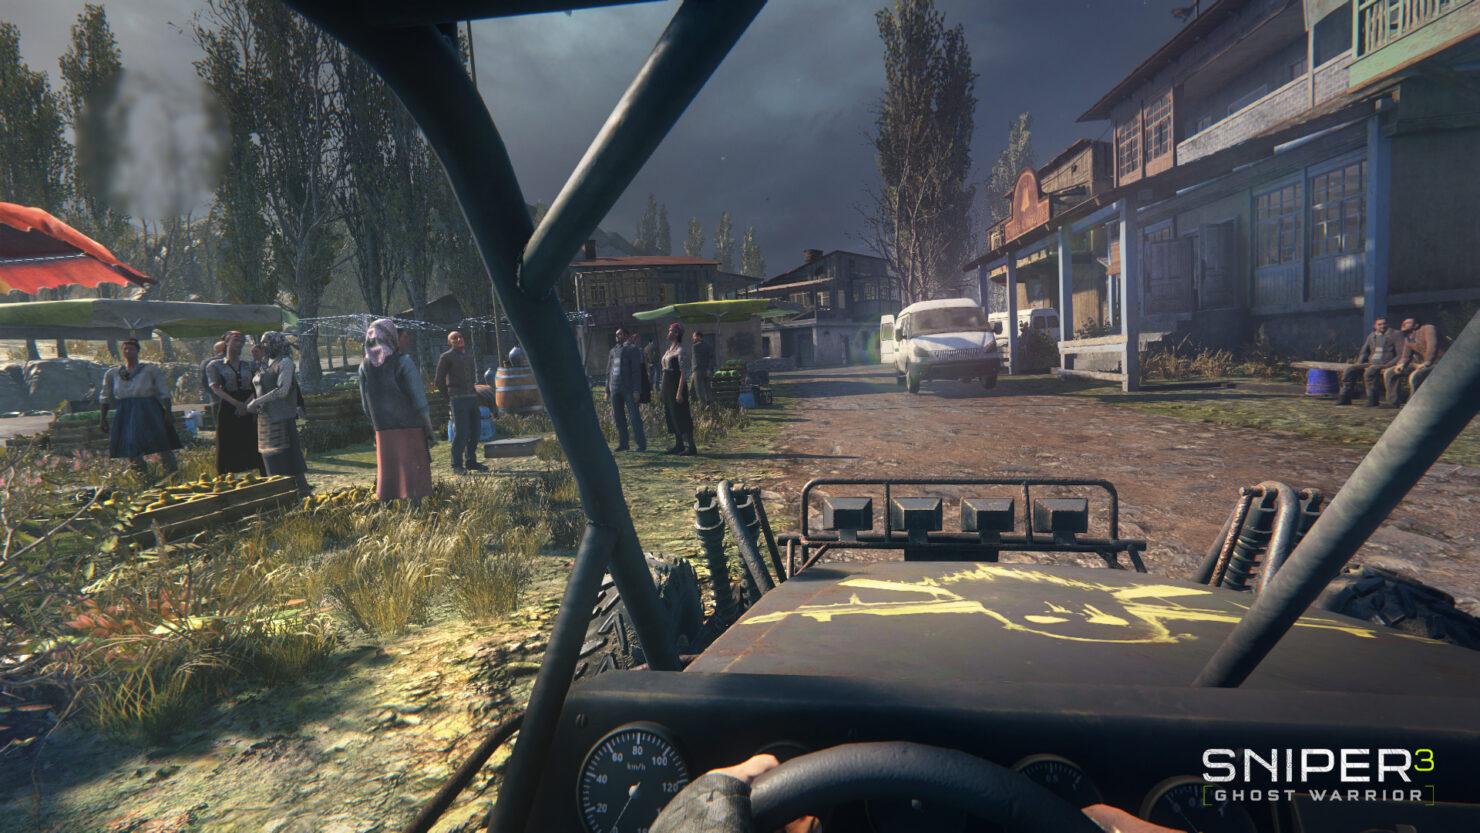 sniper3_gamescon_screenshot04